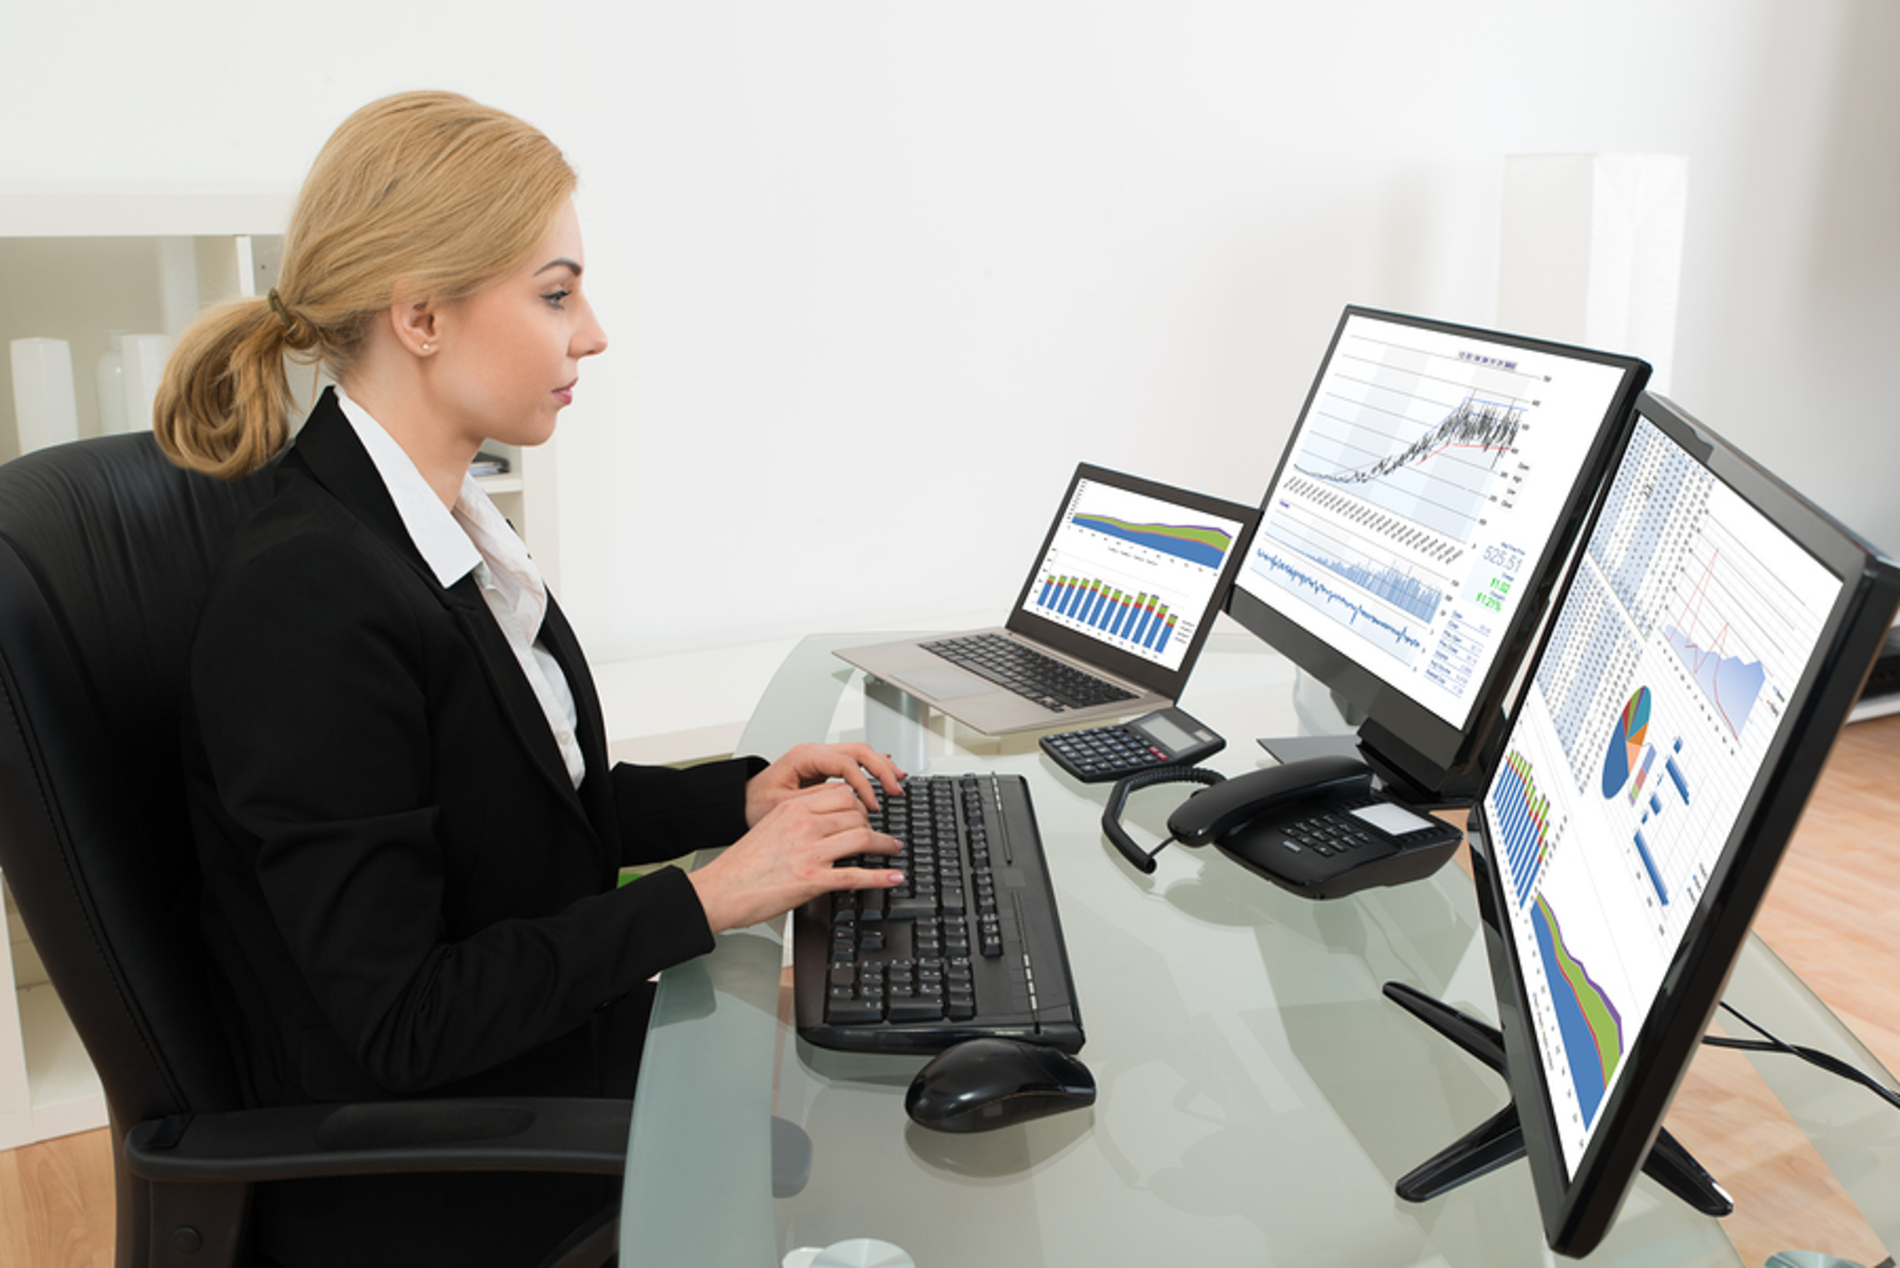 Woman typing on a desktop computer keyboard.